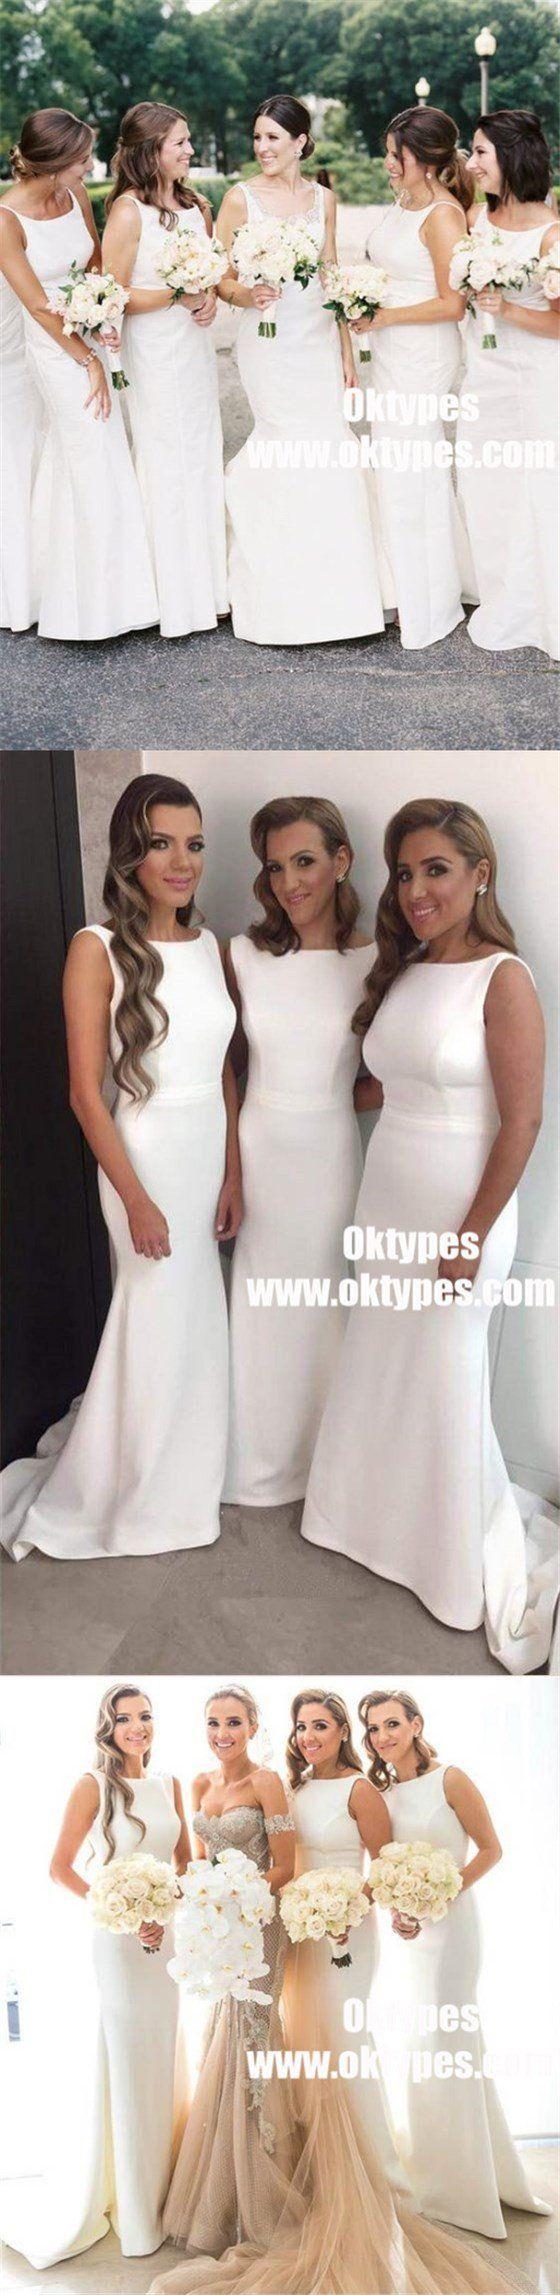 Sheath round neck sleeveless white satin bridesmaid dresses typ